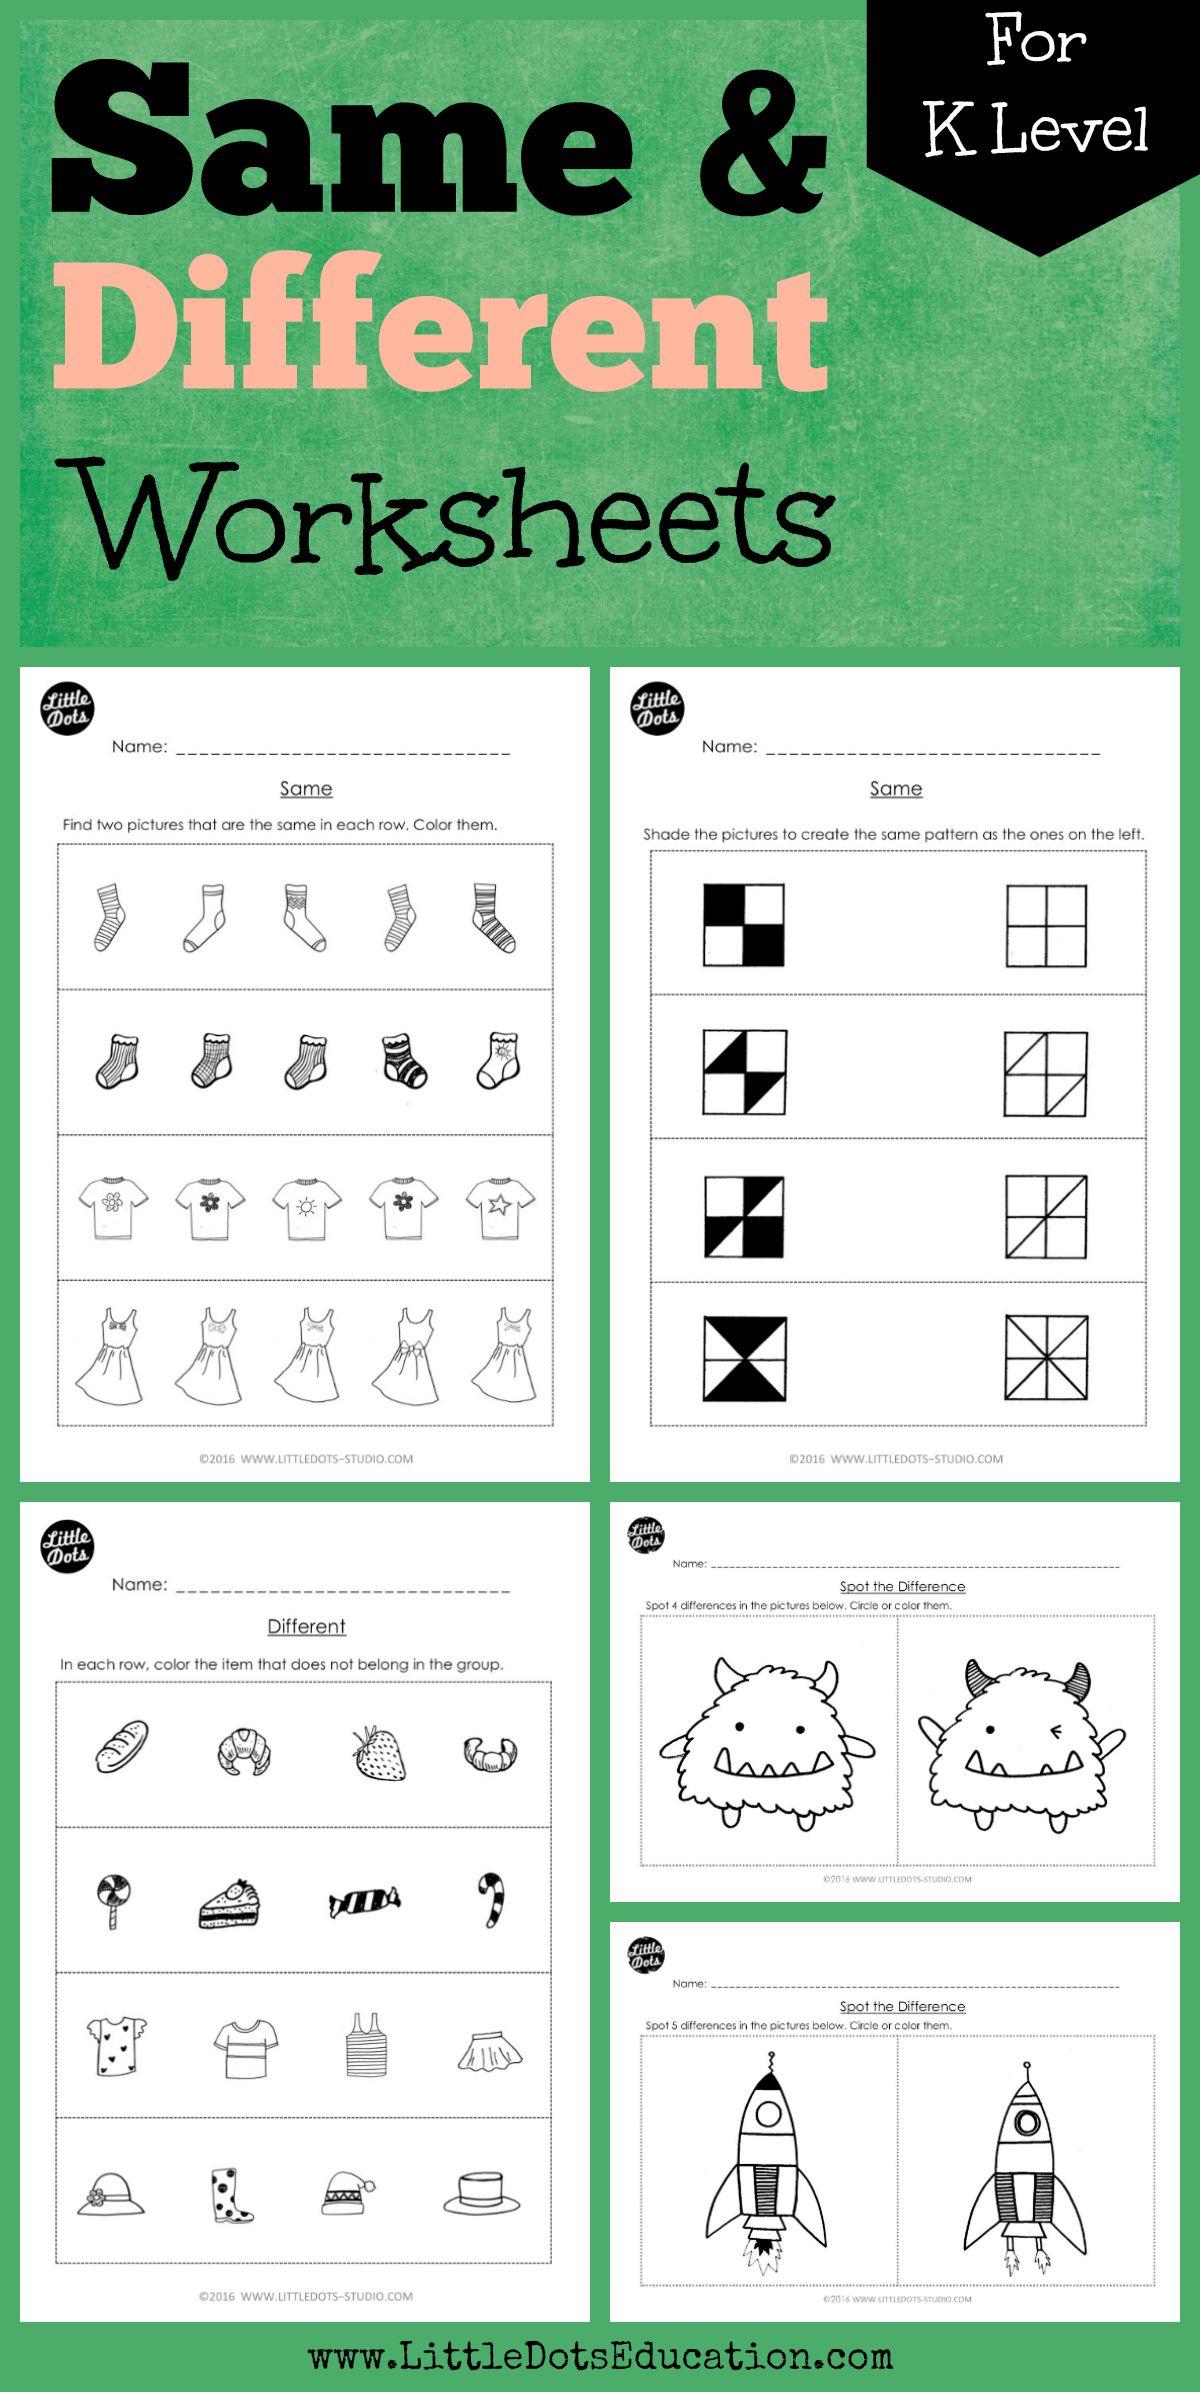 Kindergarten Same And Different Worksheets And Activities Letter Worksheets For Preschool Kindergarten Worksheets Kids Math Worksheets [ 2392 x 1200 Pixel ]